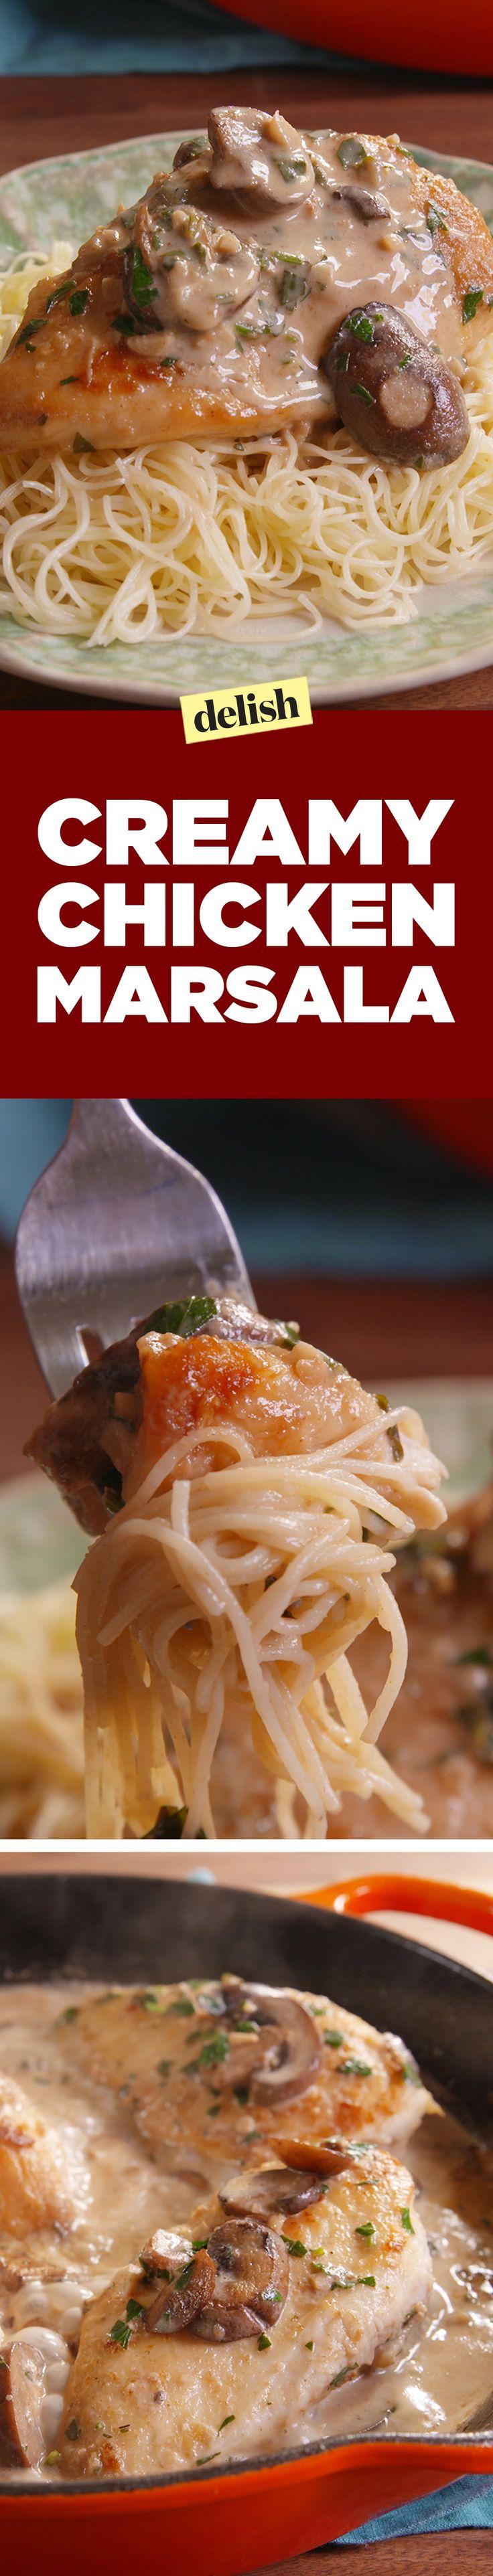 Creamy Chicken Marsala is the most popular chicken recipe on the internet. Get the recipe on Delish.com.